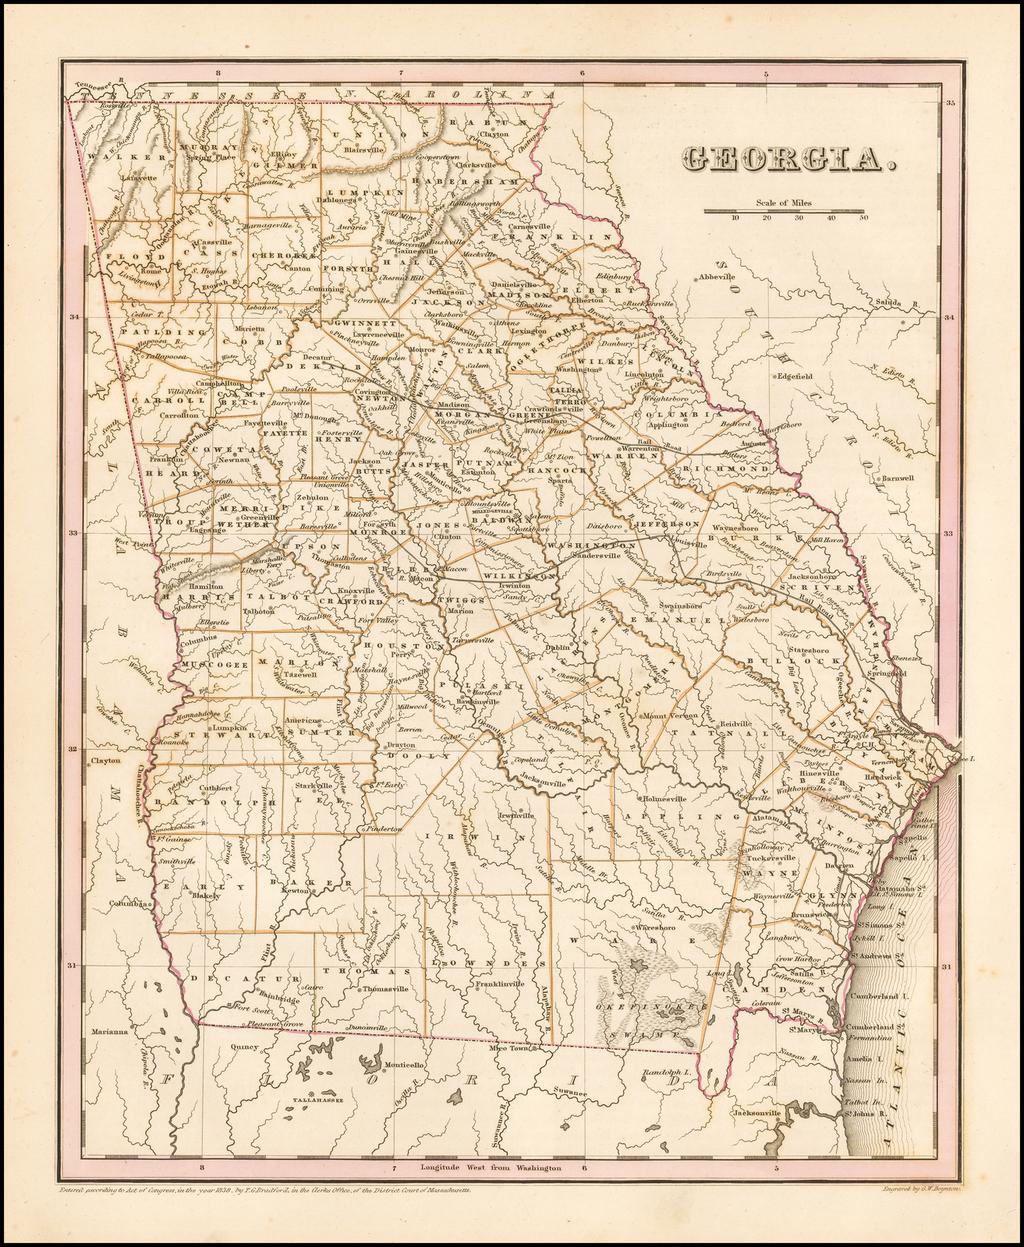 Georgia By Thomas Gamaliel Bradford